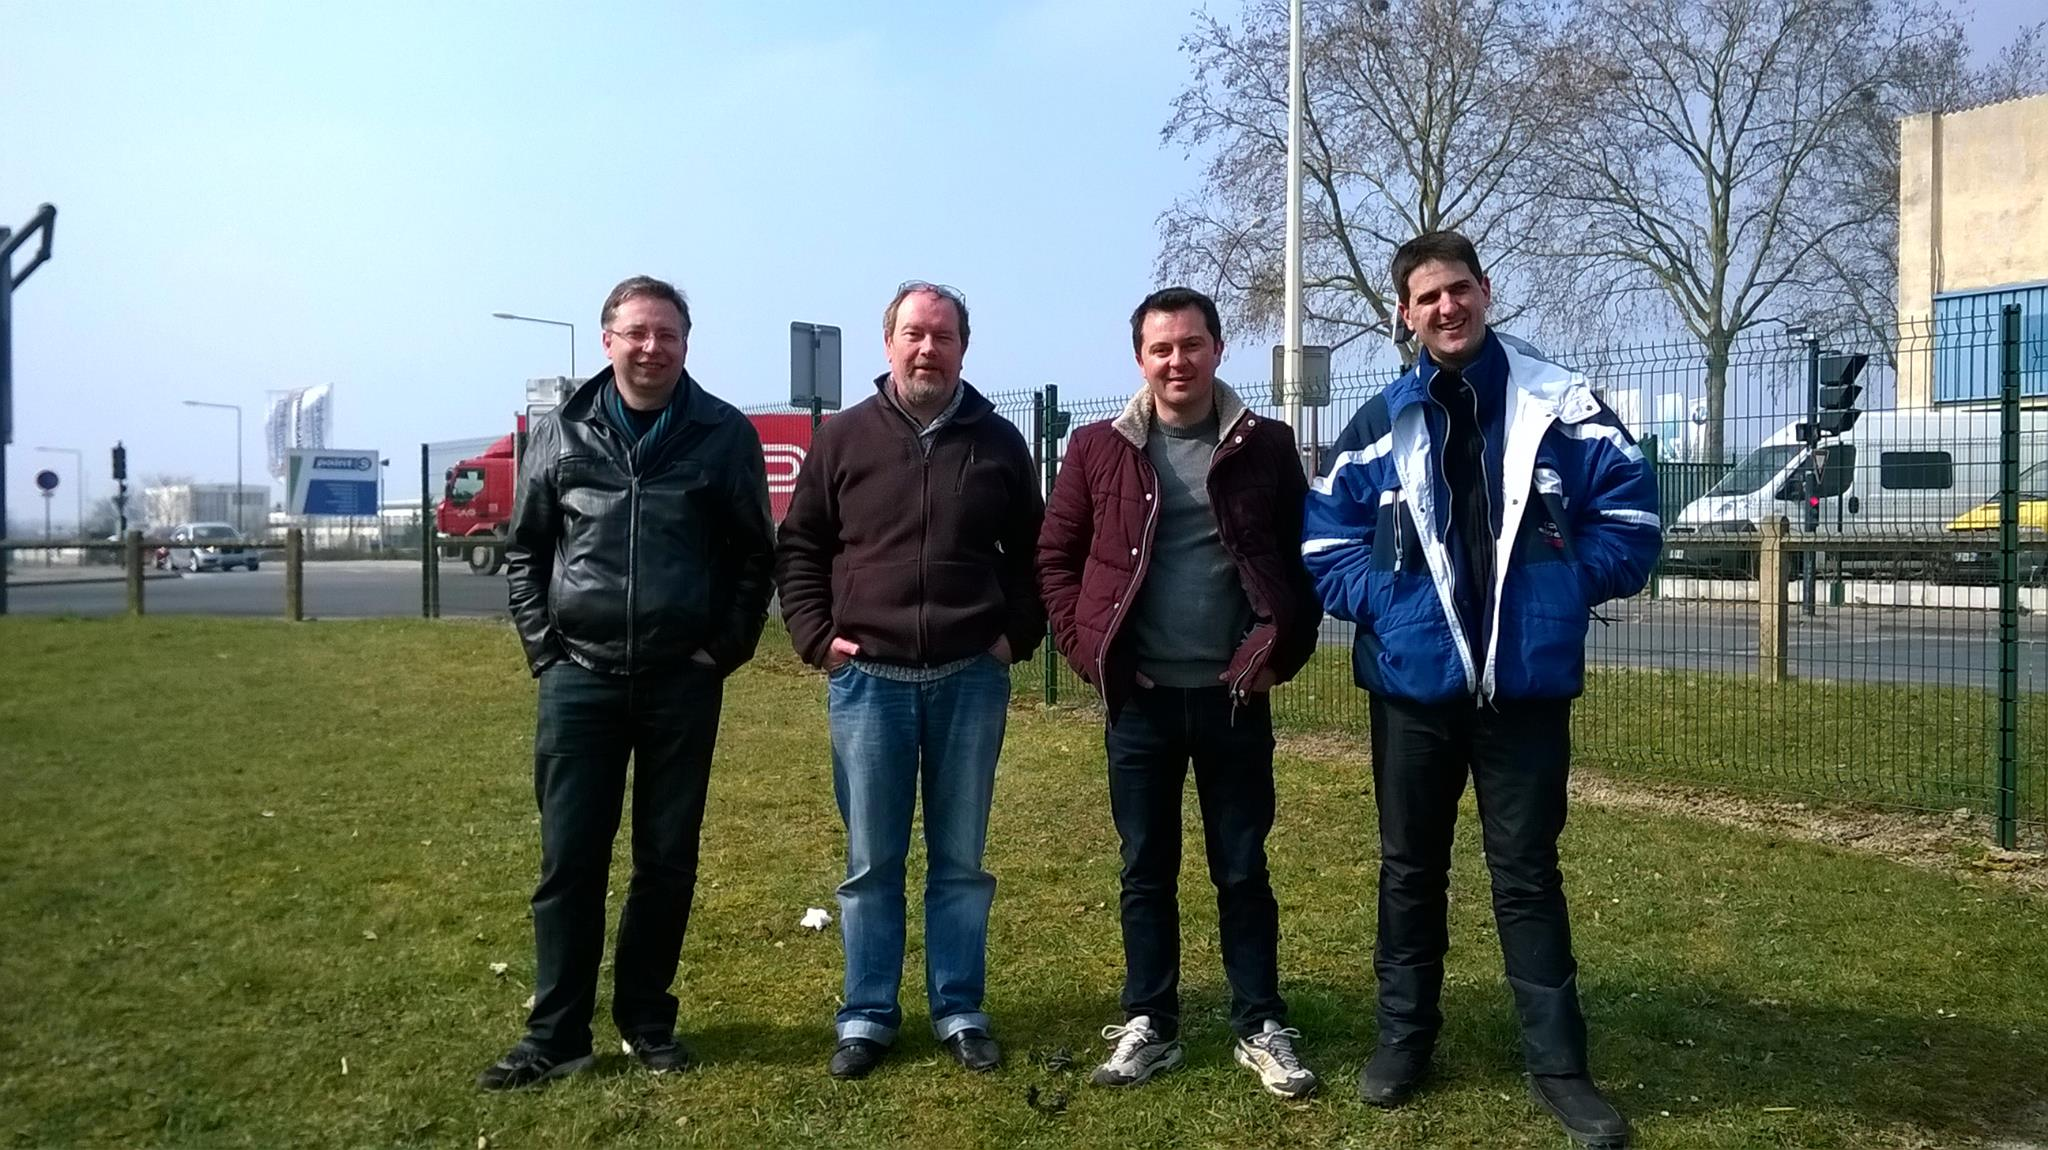 De gauche à droite : Arnaud, moi, Will et Antoine